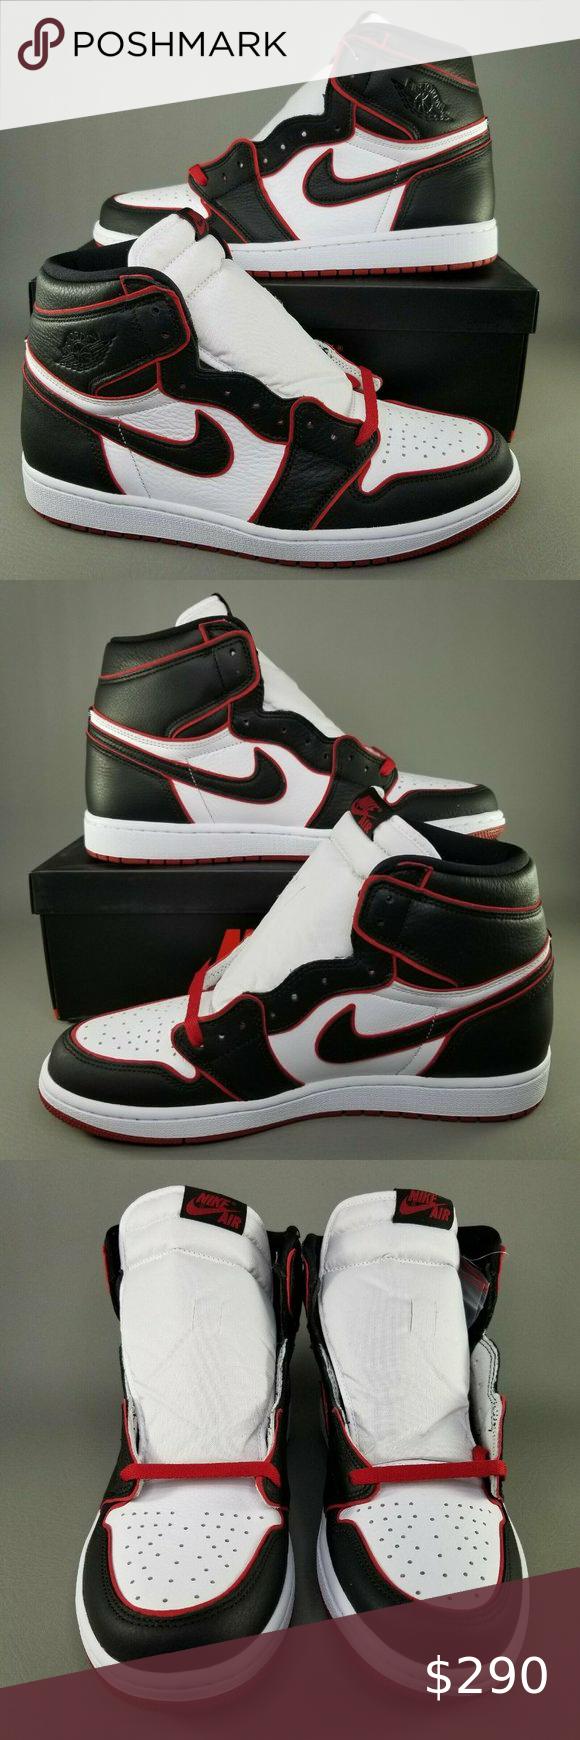 Nike Air Jordan 1 Retro High OG Bloodlines 12 Nike Air